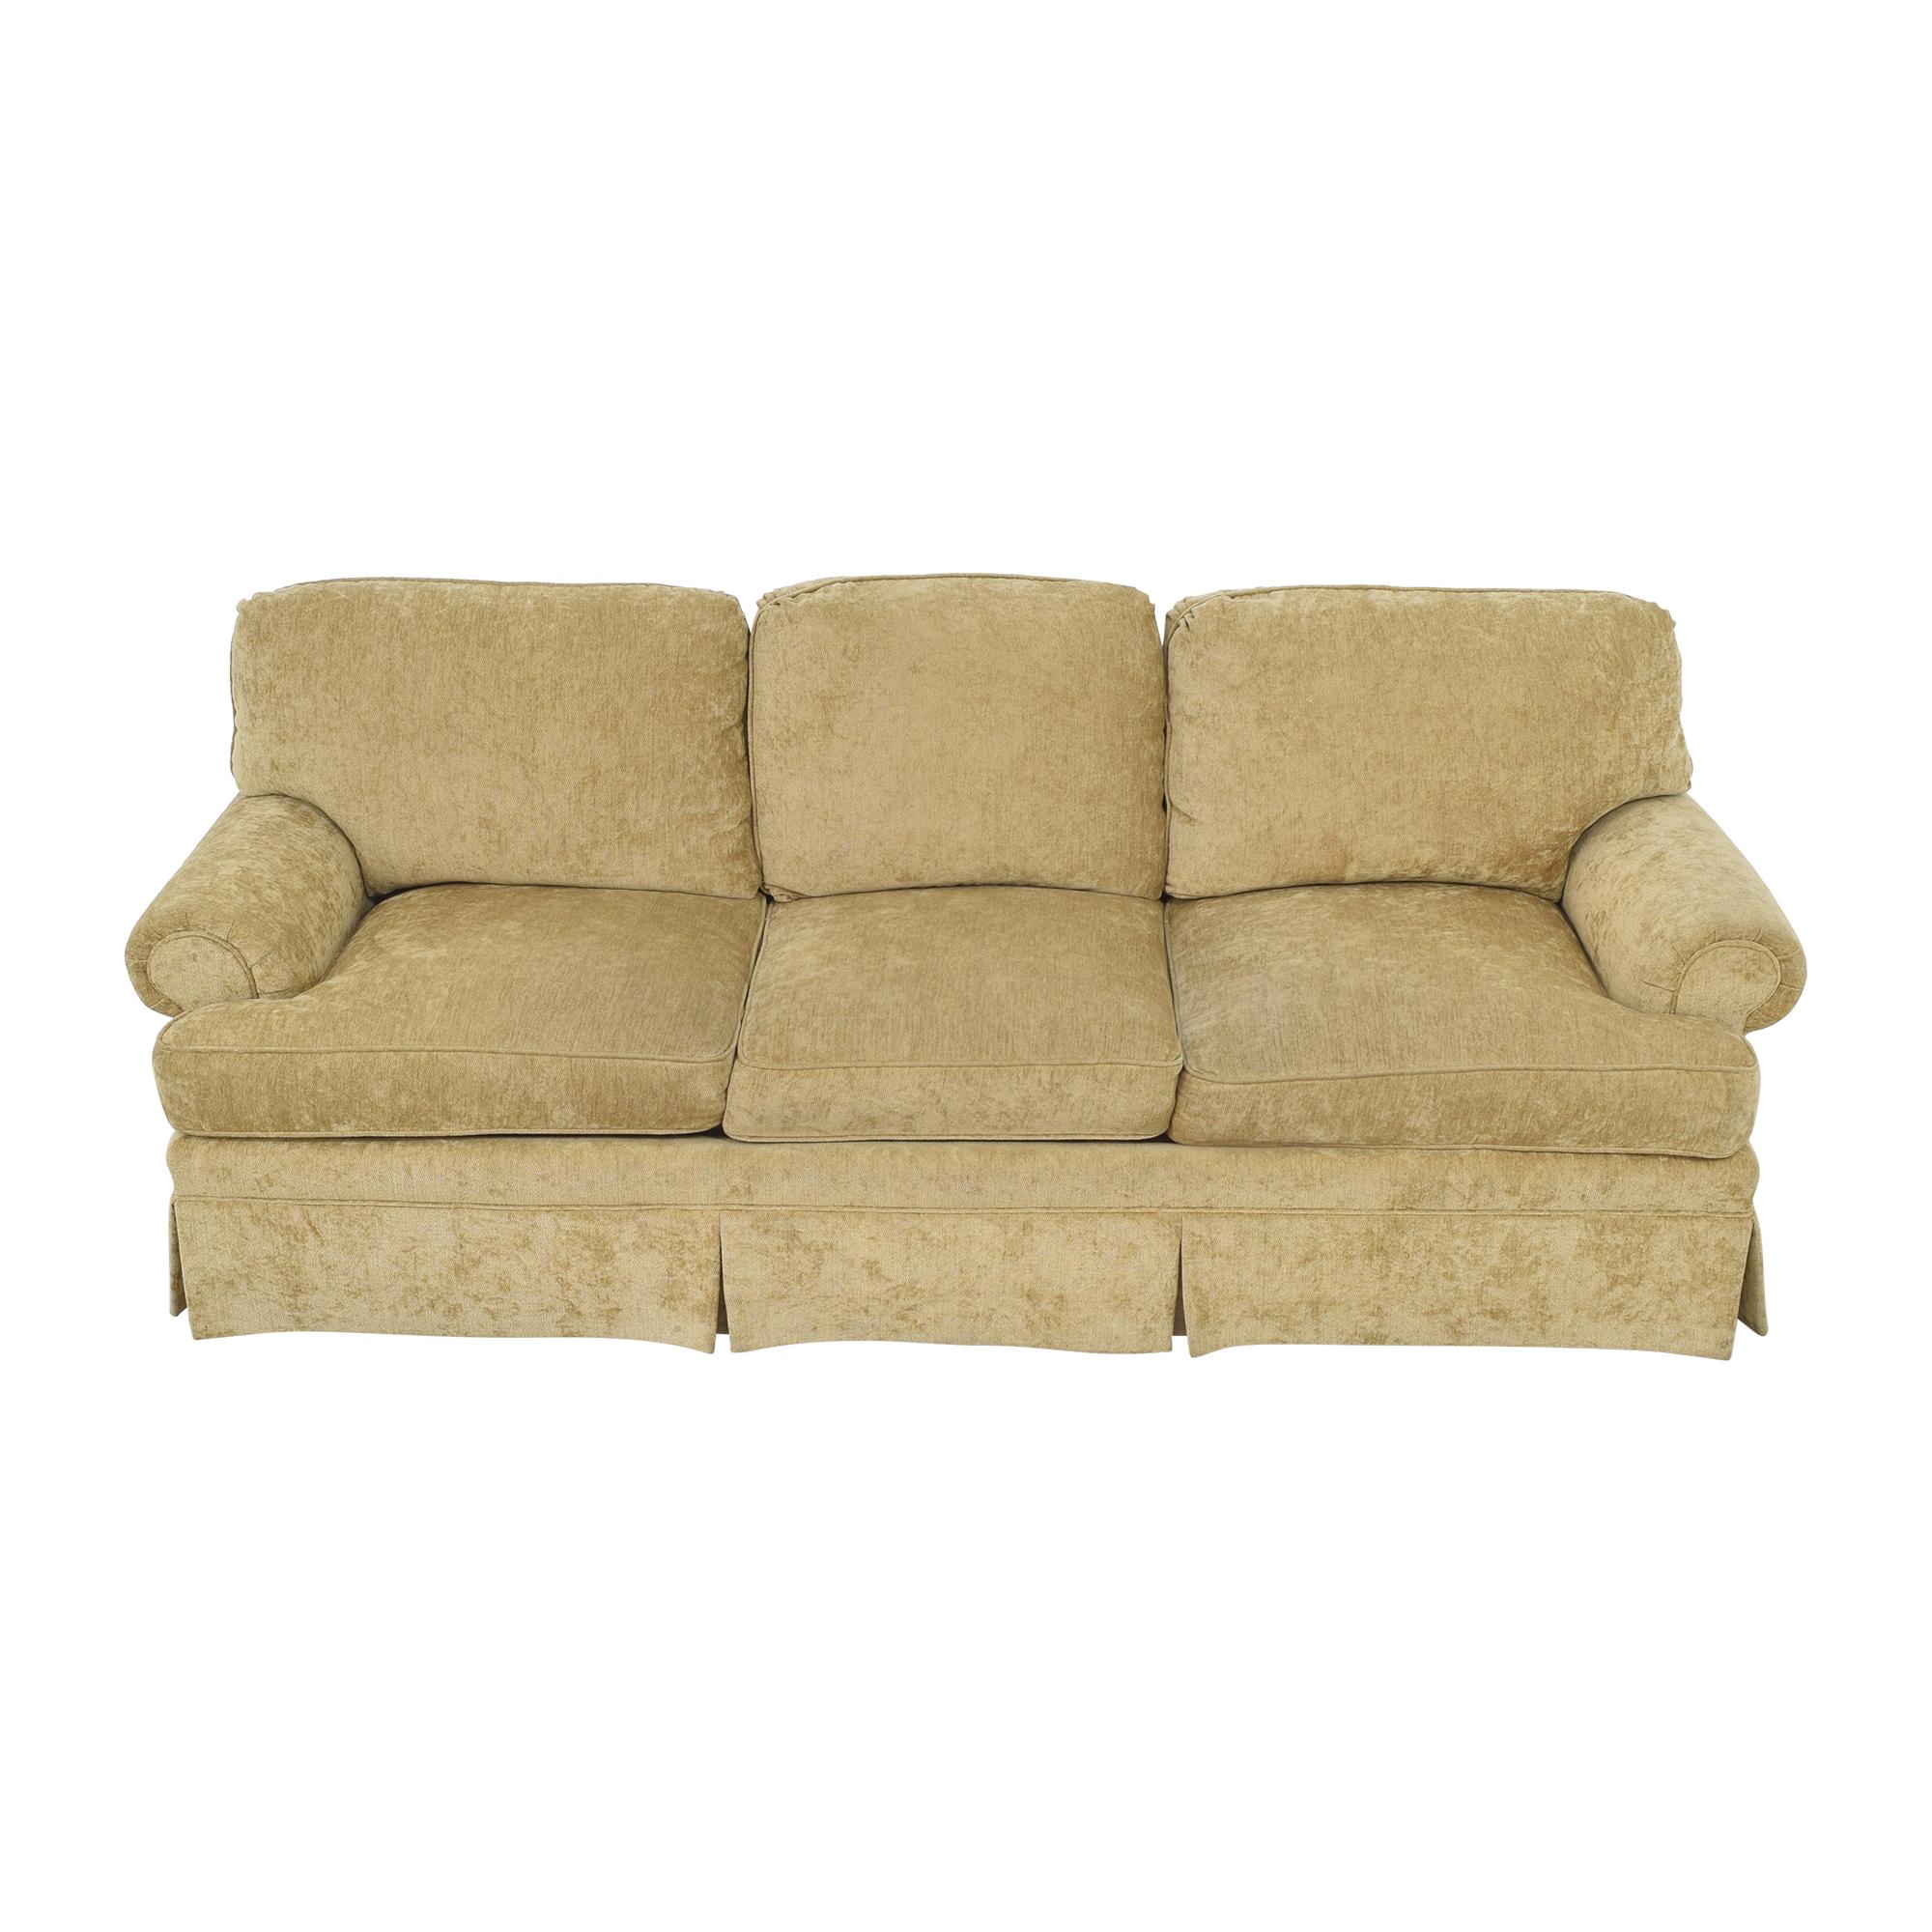 Century Furniture Century Furniture Roll Arm Skirted Sofa on sale